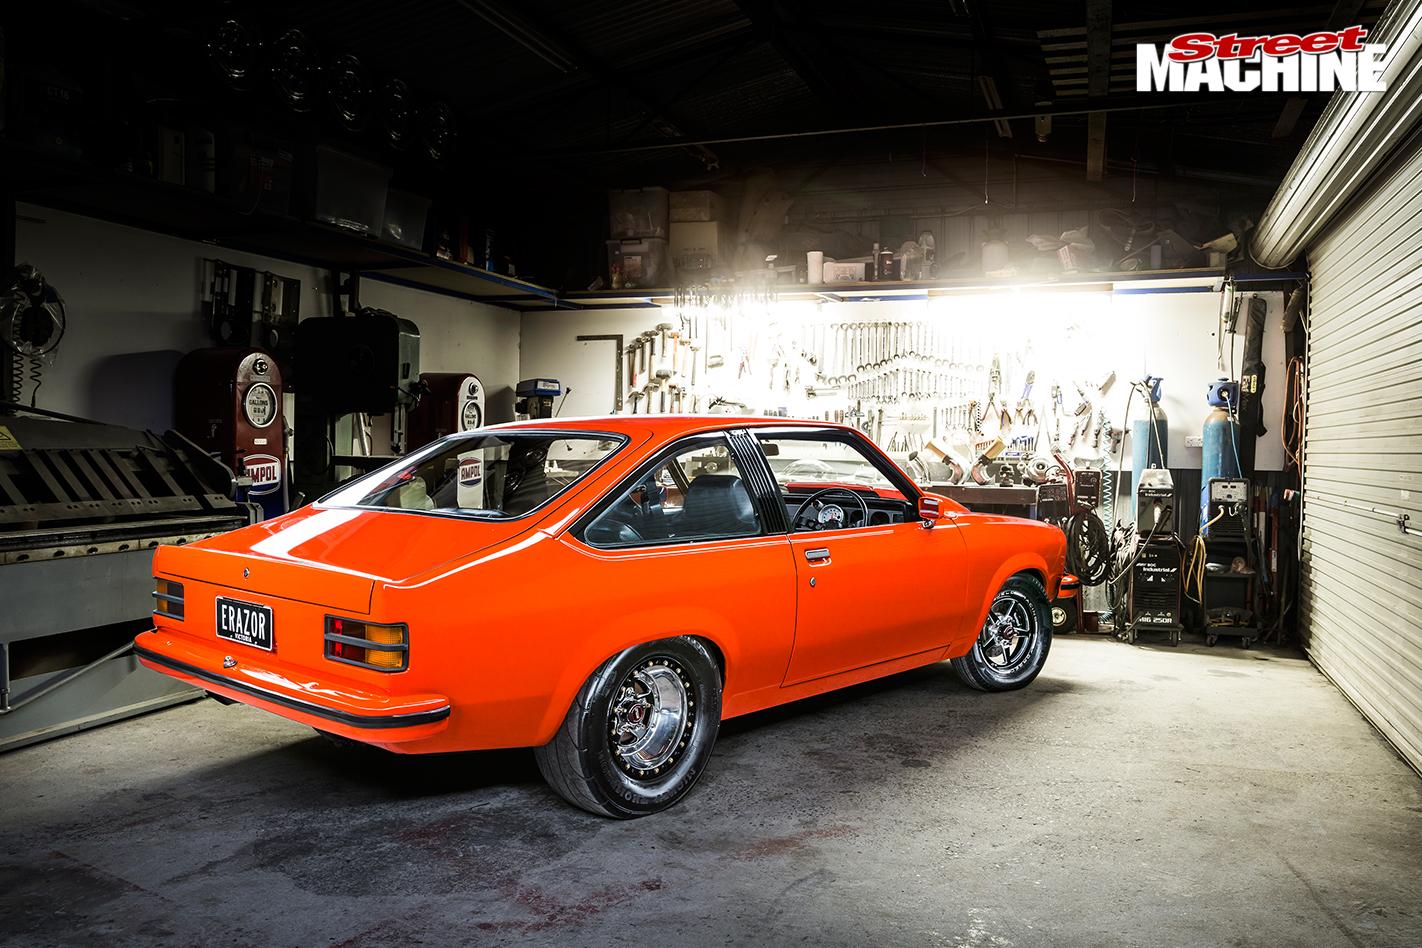 1976-SIX-CYLINDER-HOLDEN-LX-TORANA-HATCH-rear